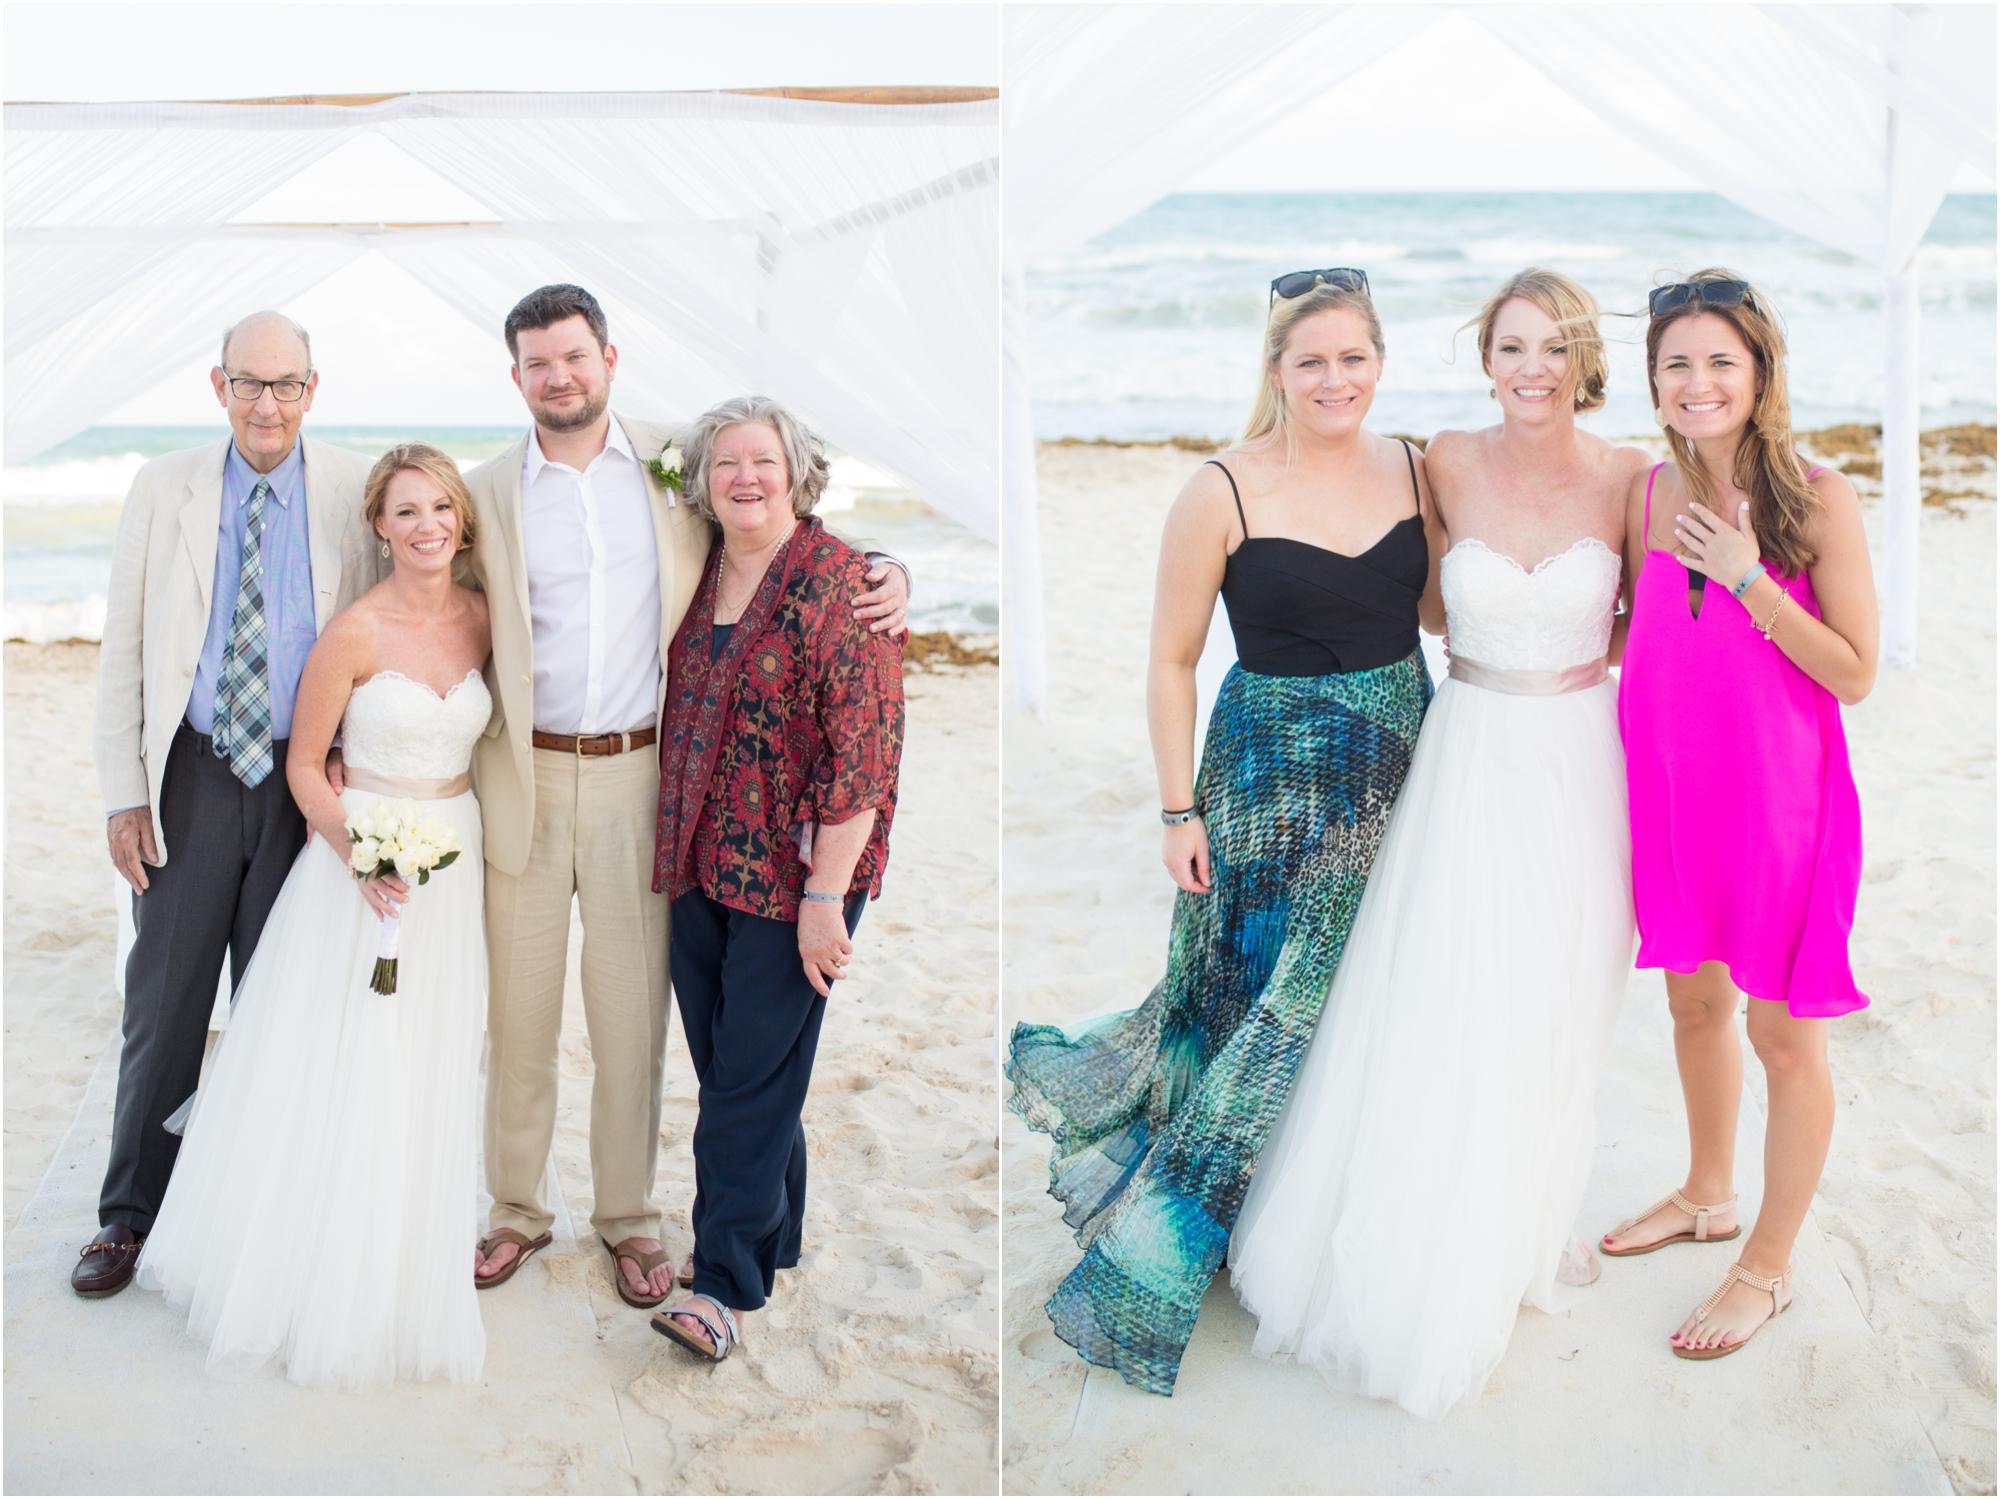 Morosoff Wedding 3-Family Formals-311_anna grace photography destination wedding photographer playa del carmen mexico photo.jpg